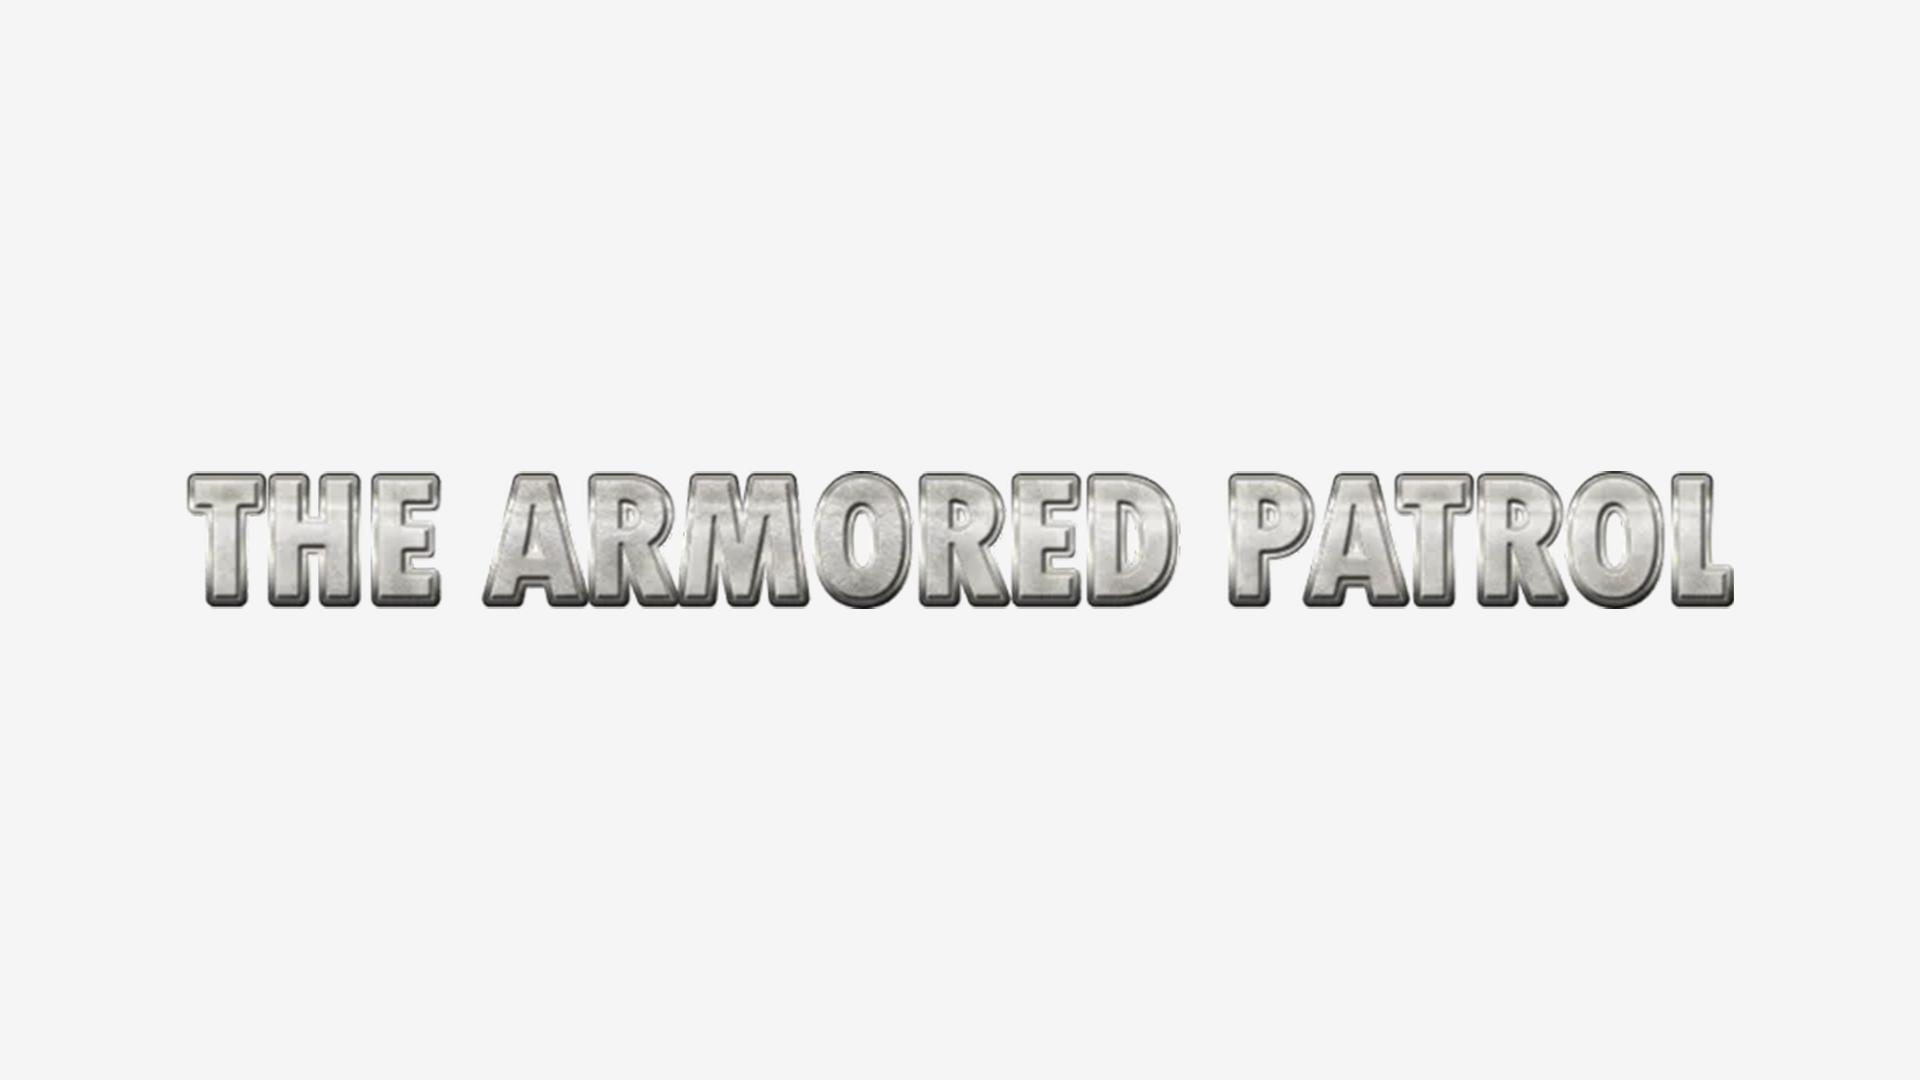 The-Armored-Patrol-logo